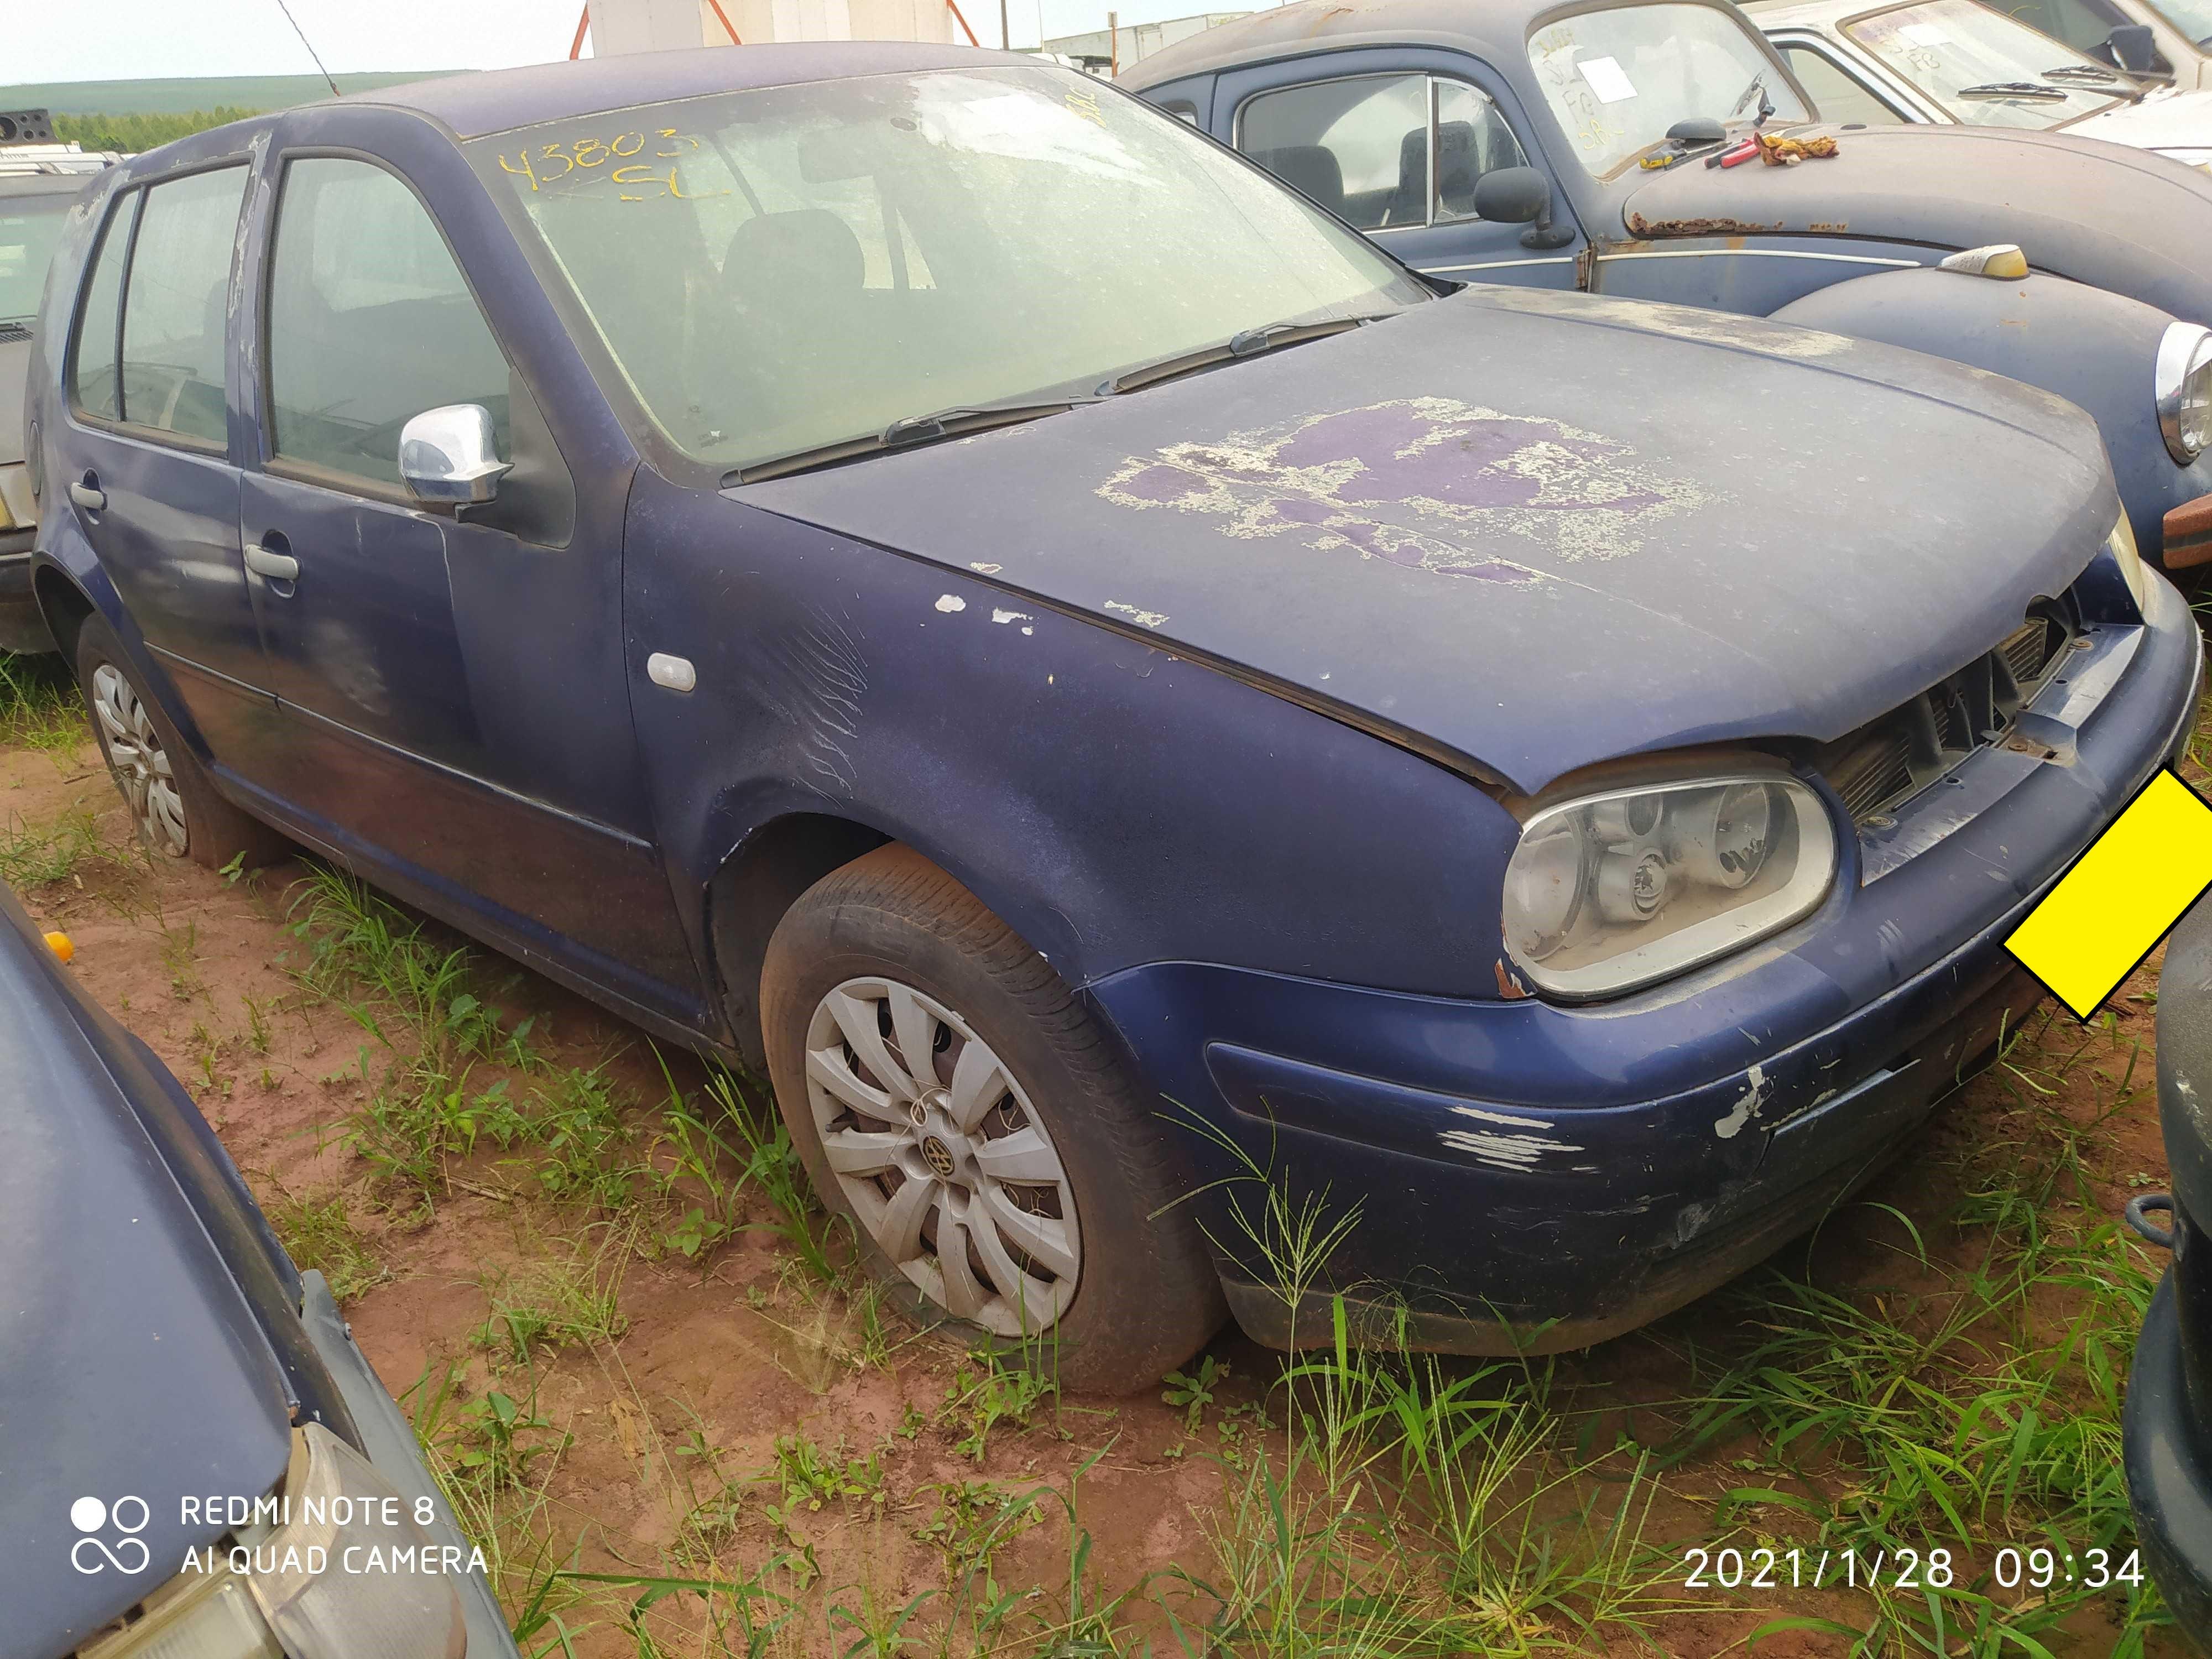 VW/GOLF - 1999/2000 - Sucata aproveitável motor inservível